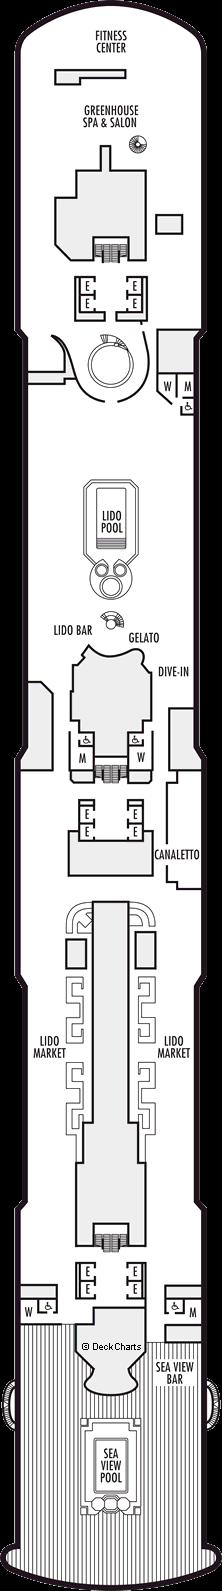 Koningsdam: Lido Deck